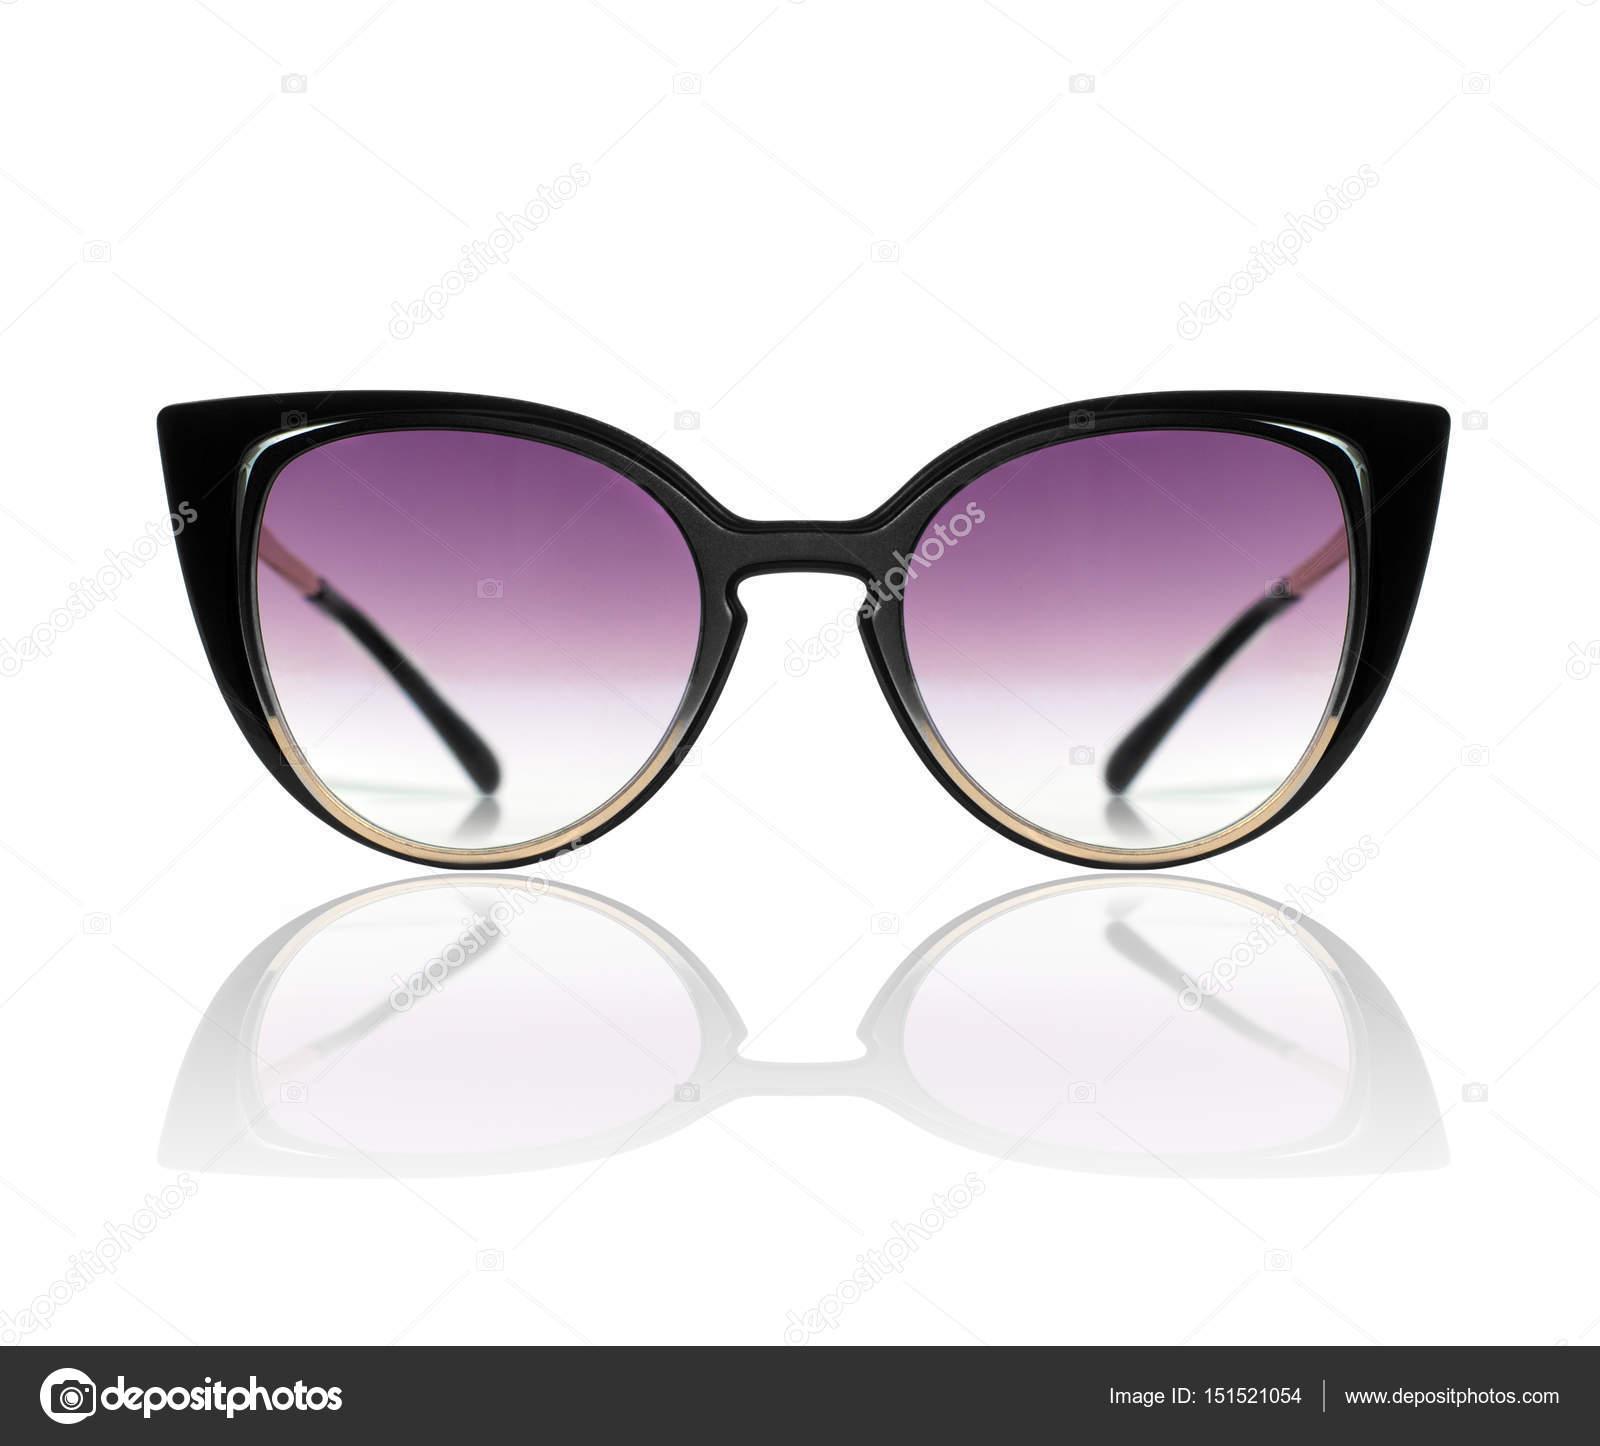 4c612e1bea Κομψά Γυναικεία γυαλιά ηλίου που απομονώνονται σε λευκό φόντο– εικόνα  αρχείου